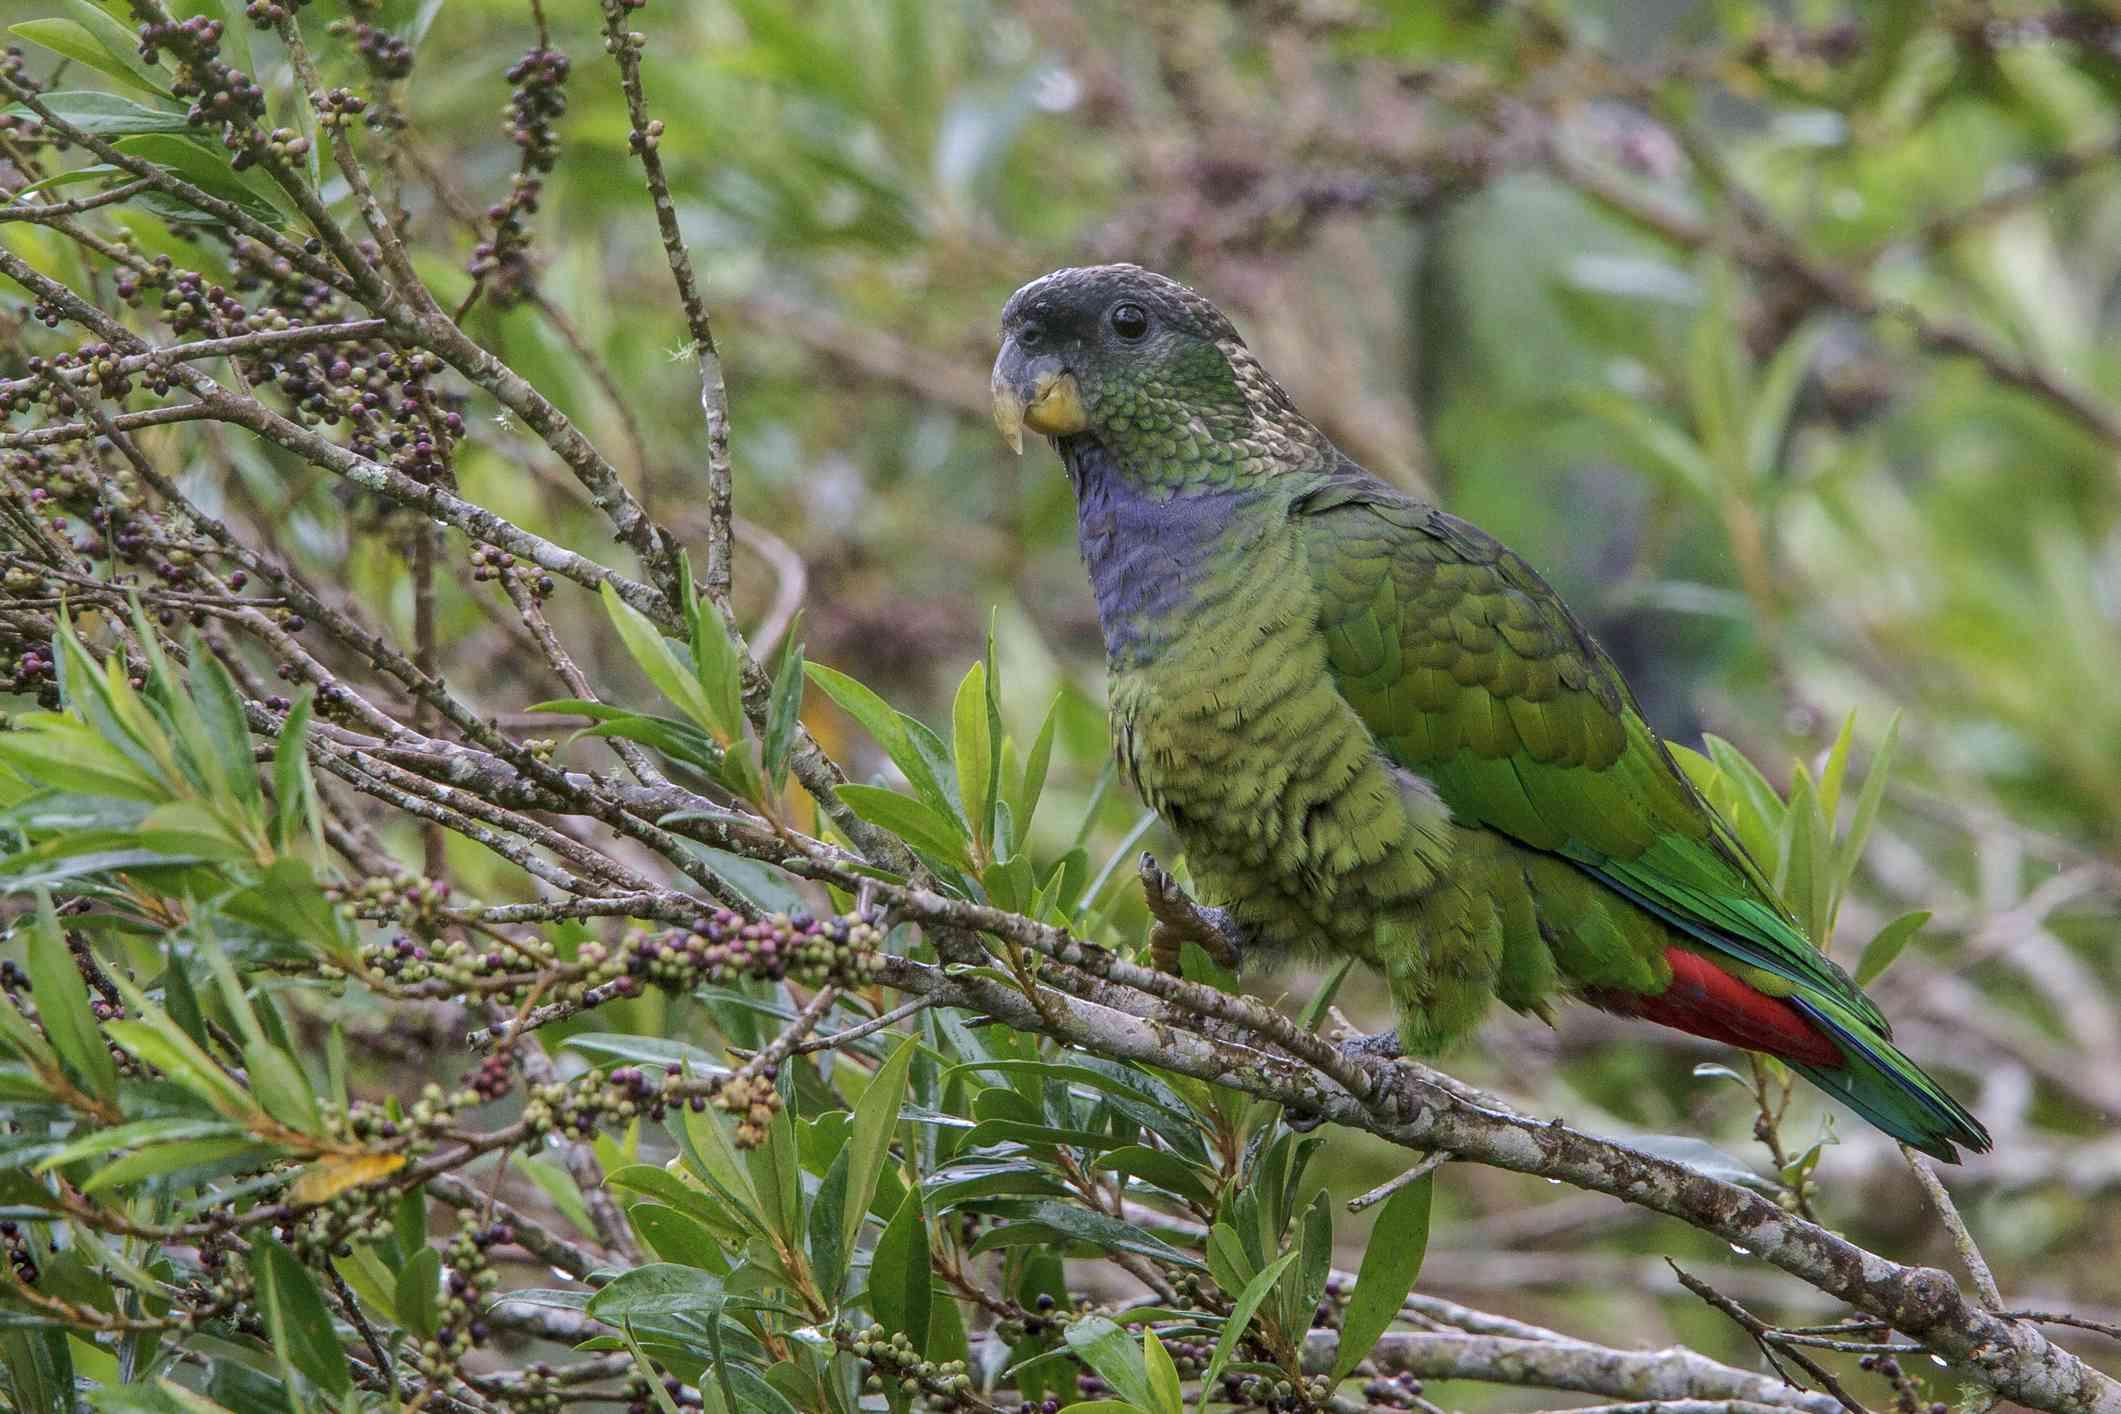 Pionus parrot in a tree